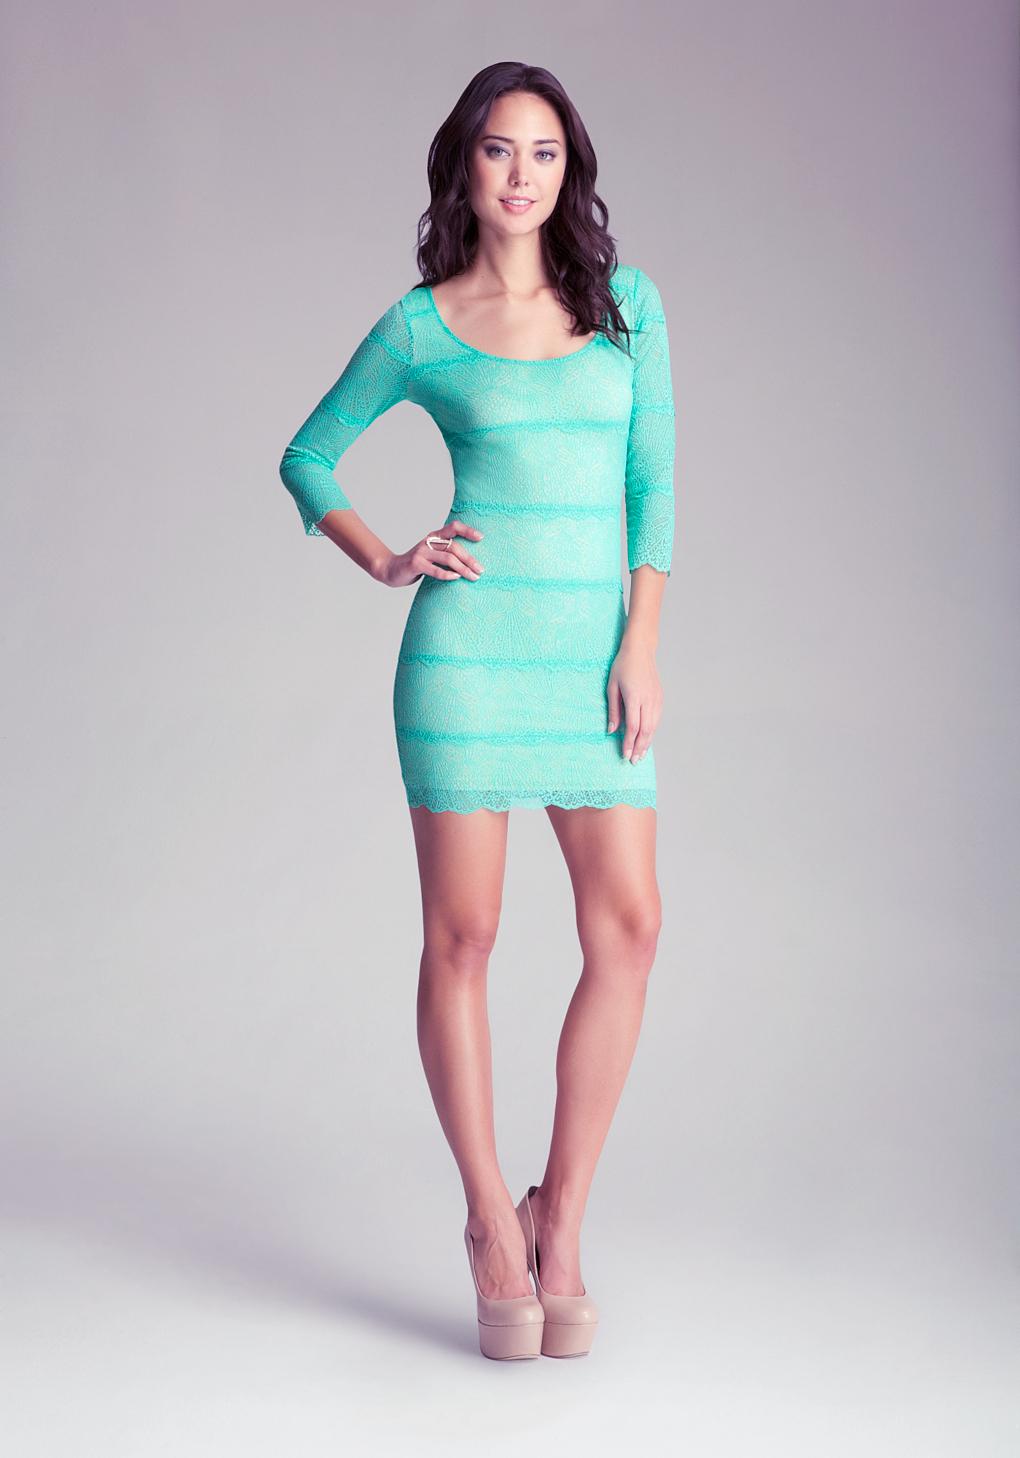 Lyst - Bebe Carolina Lace Dress in Green